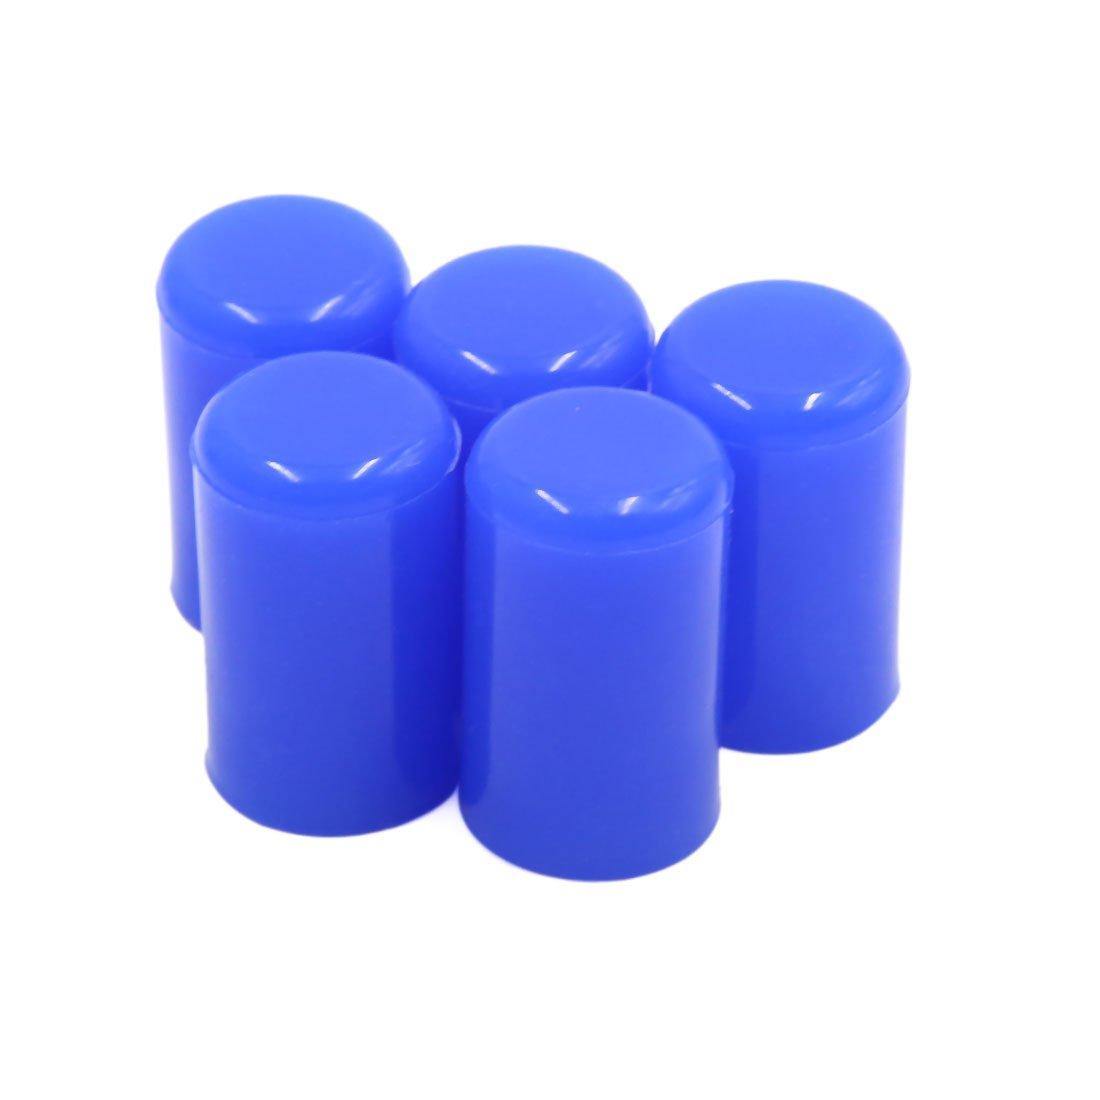 Silicone Hose End Blanking Caps/Silicone Hose End Plug